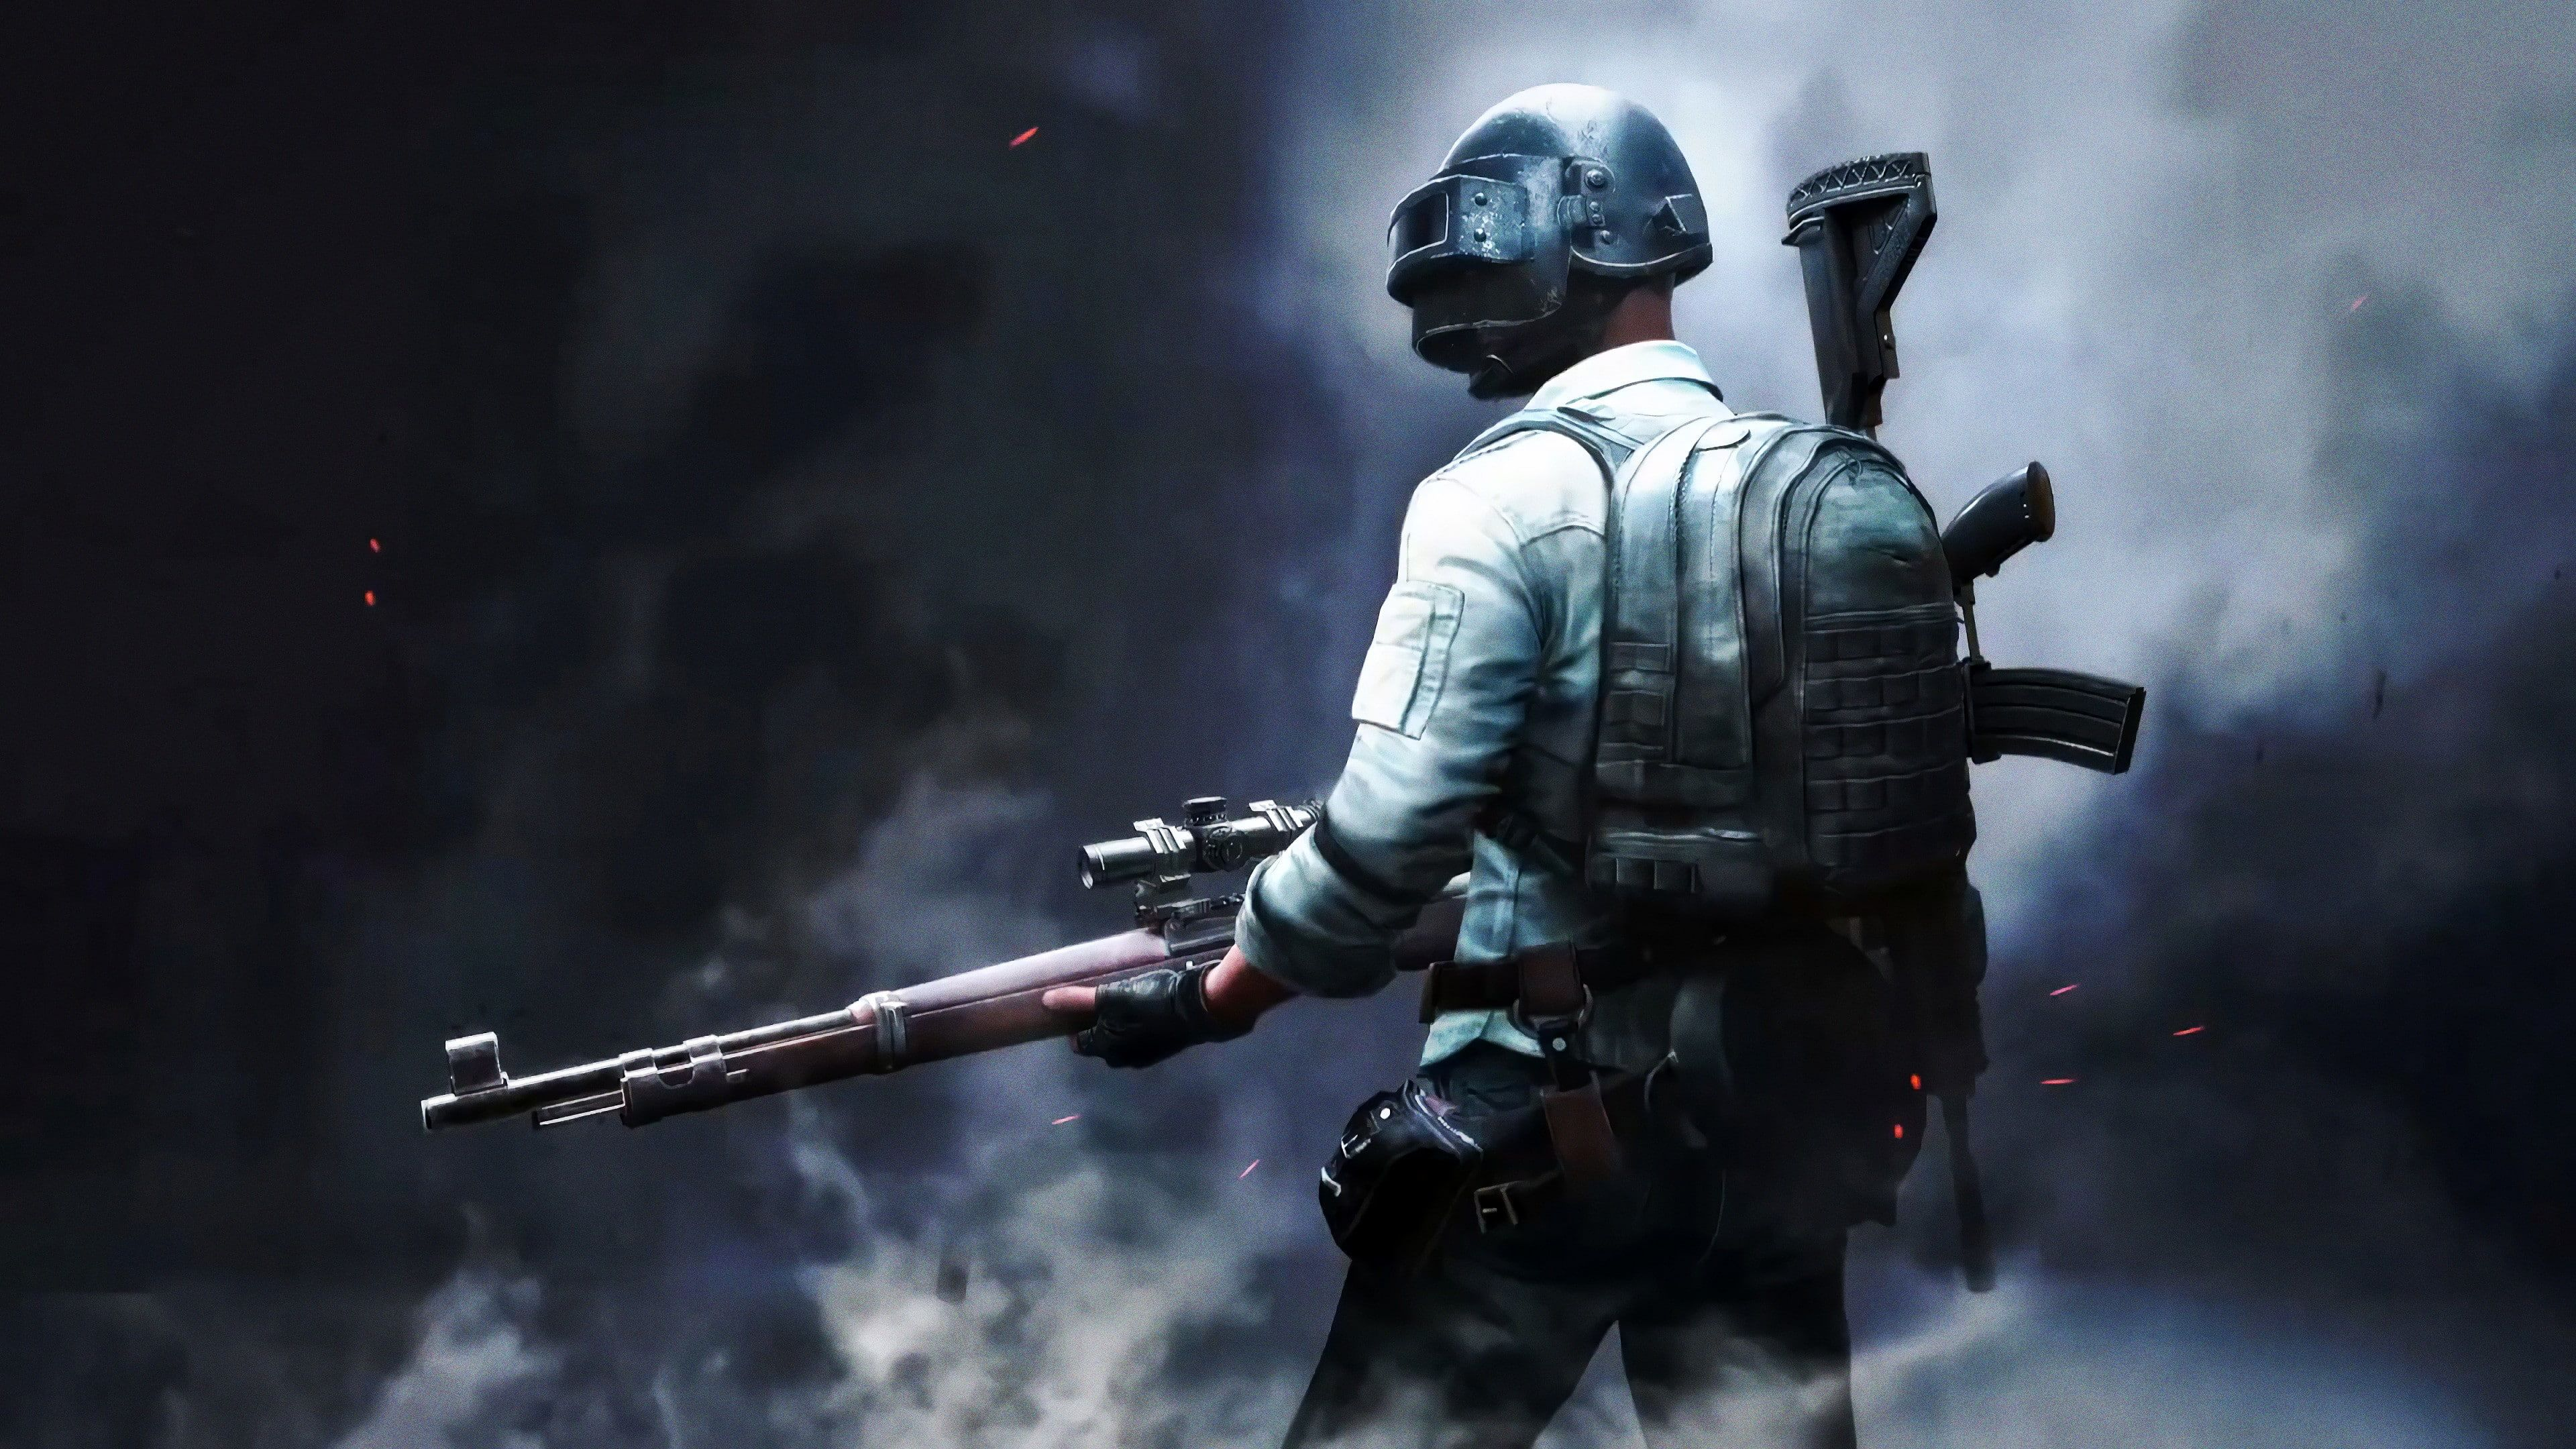 2pubg Playerunknowns Battlegrounds 2018 Games Games Hd